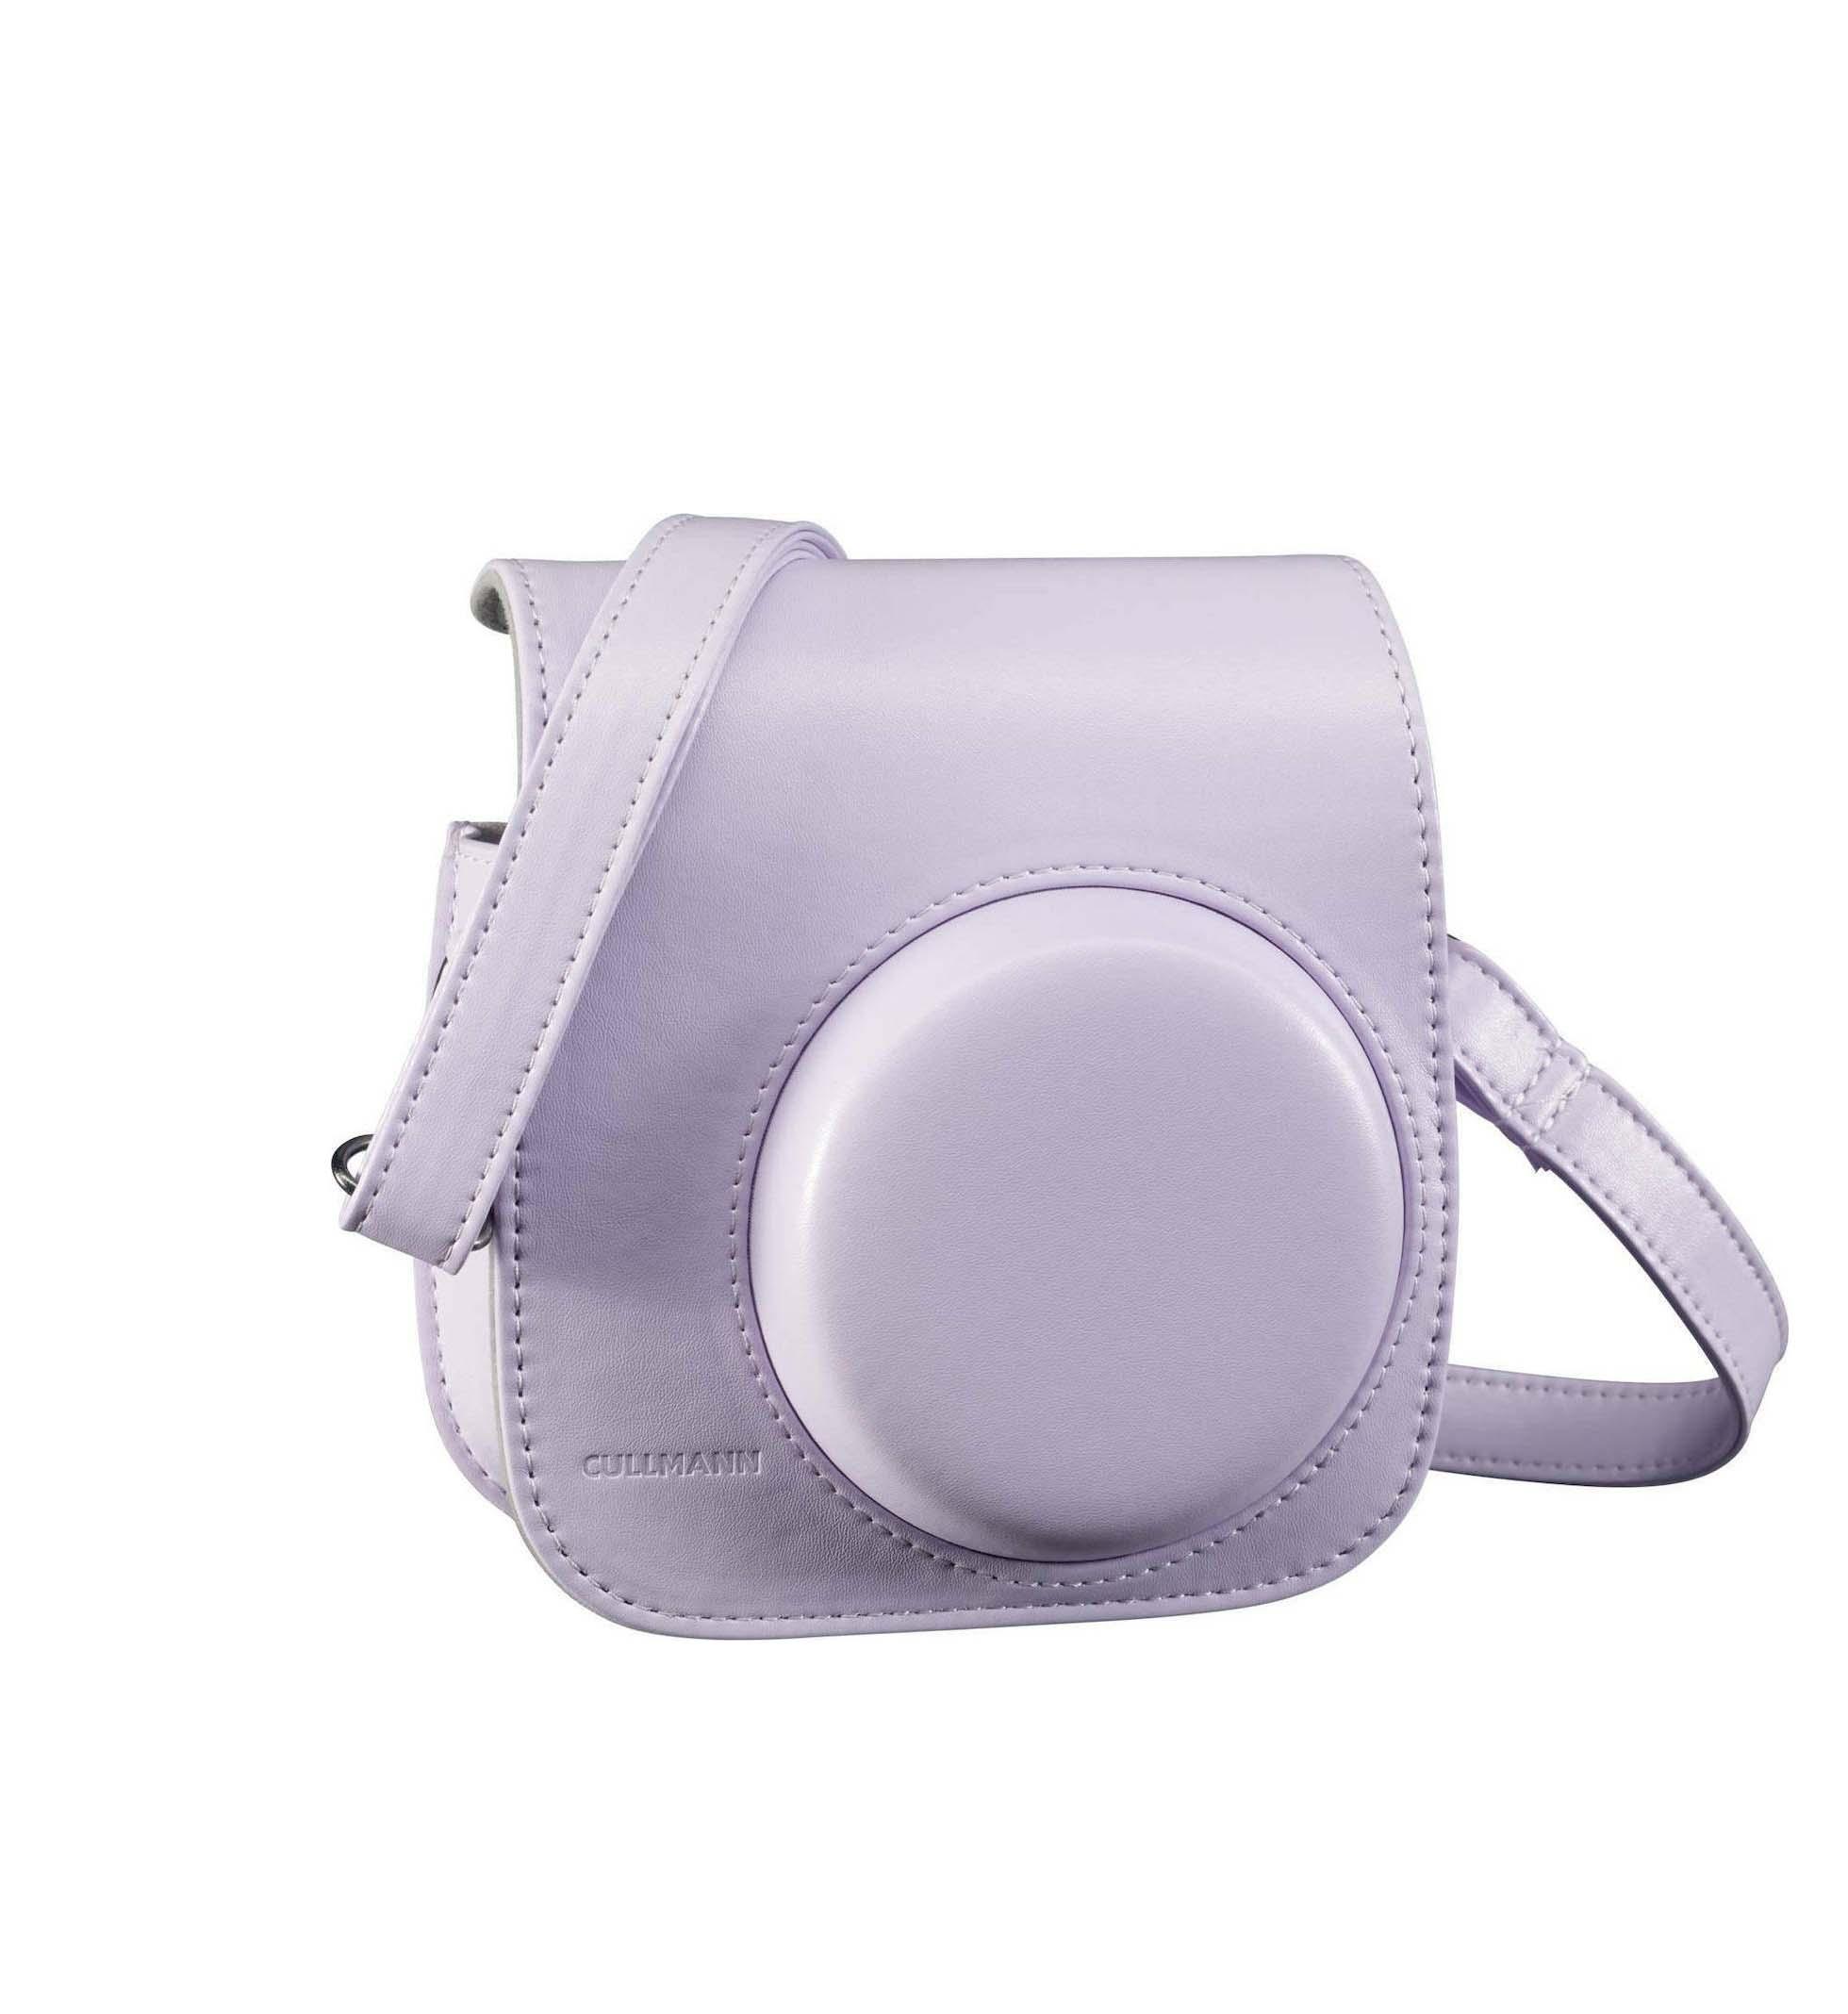 Cullmann Rio Fit 110 Camera Bag For Instax Mini 11 Lilac 98862